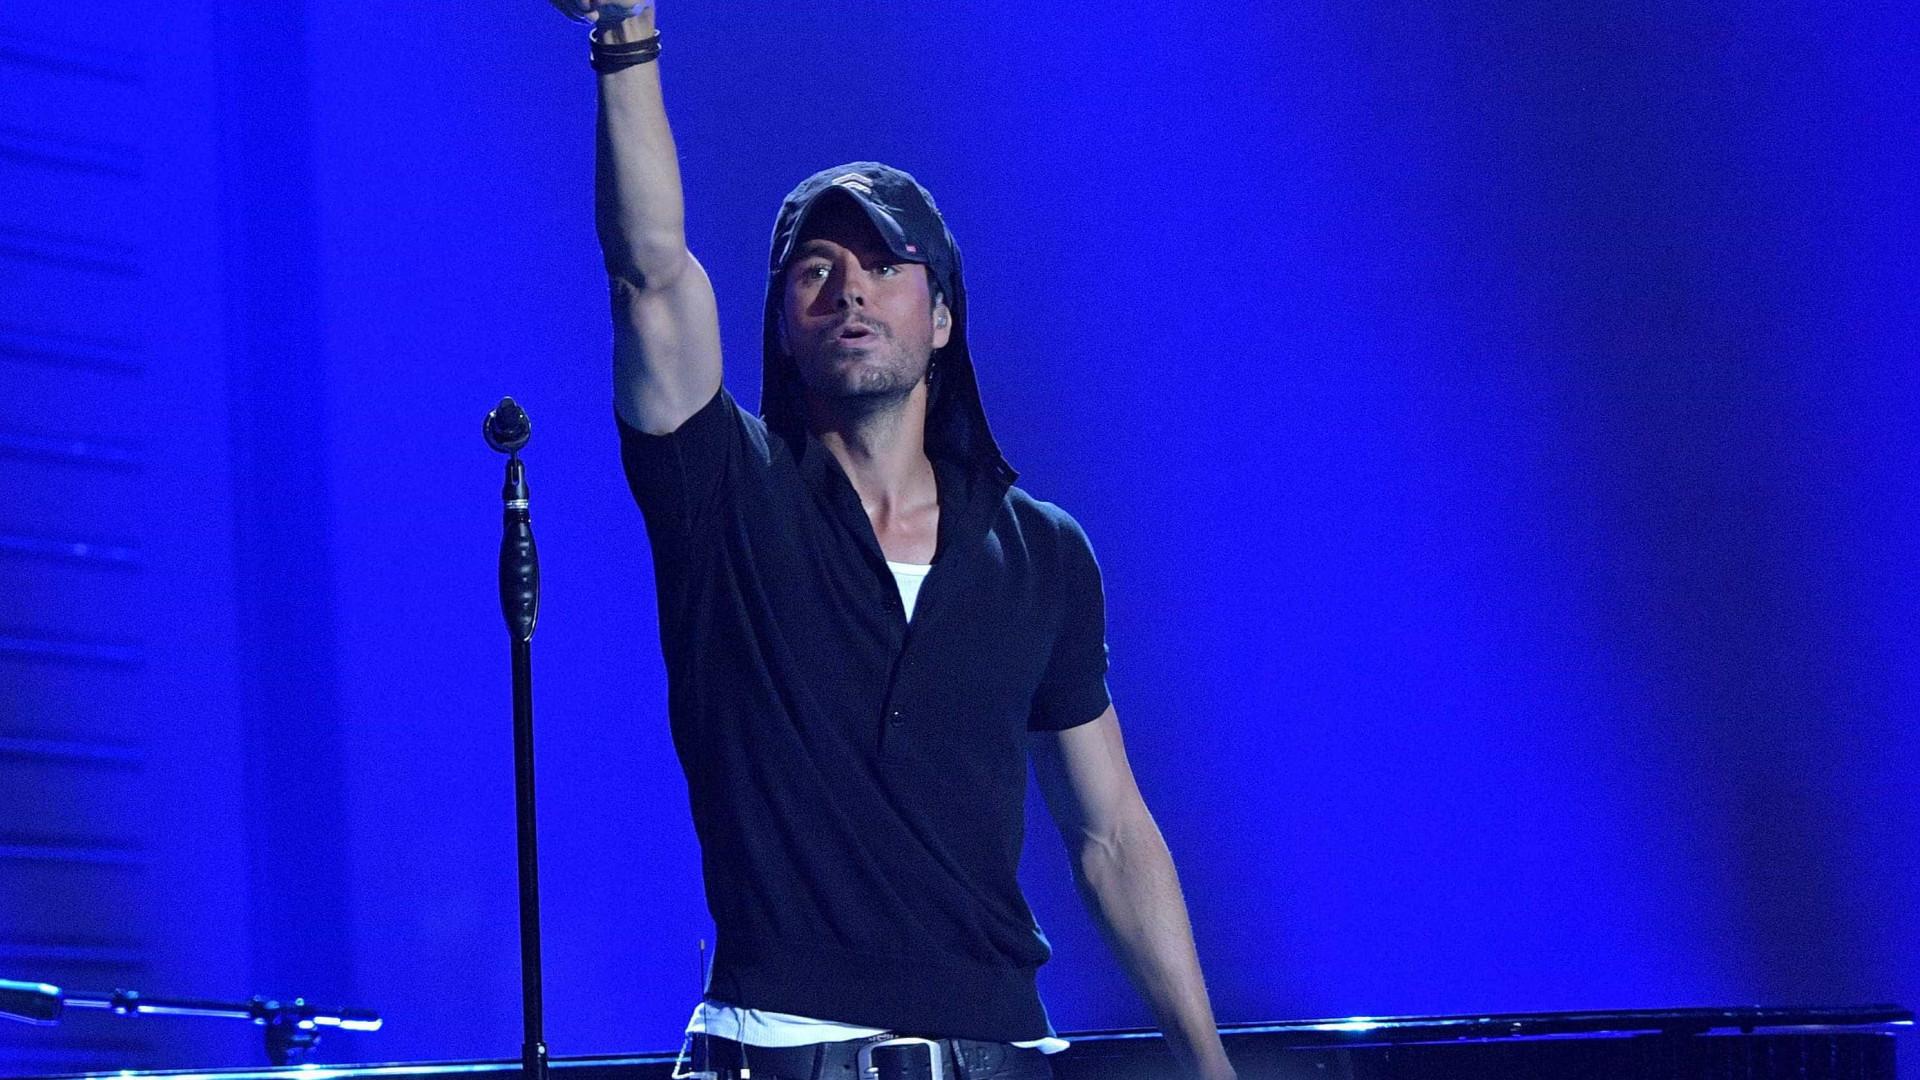 Enrique Iglesias vai doar 7% das receitas do concerto em Lisboa ao IPO